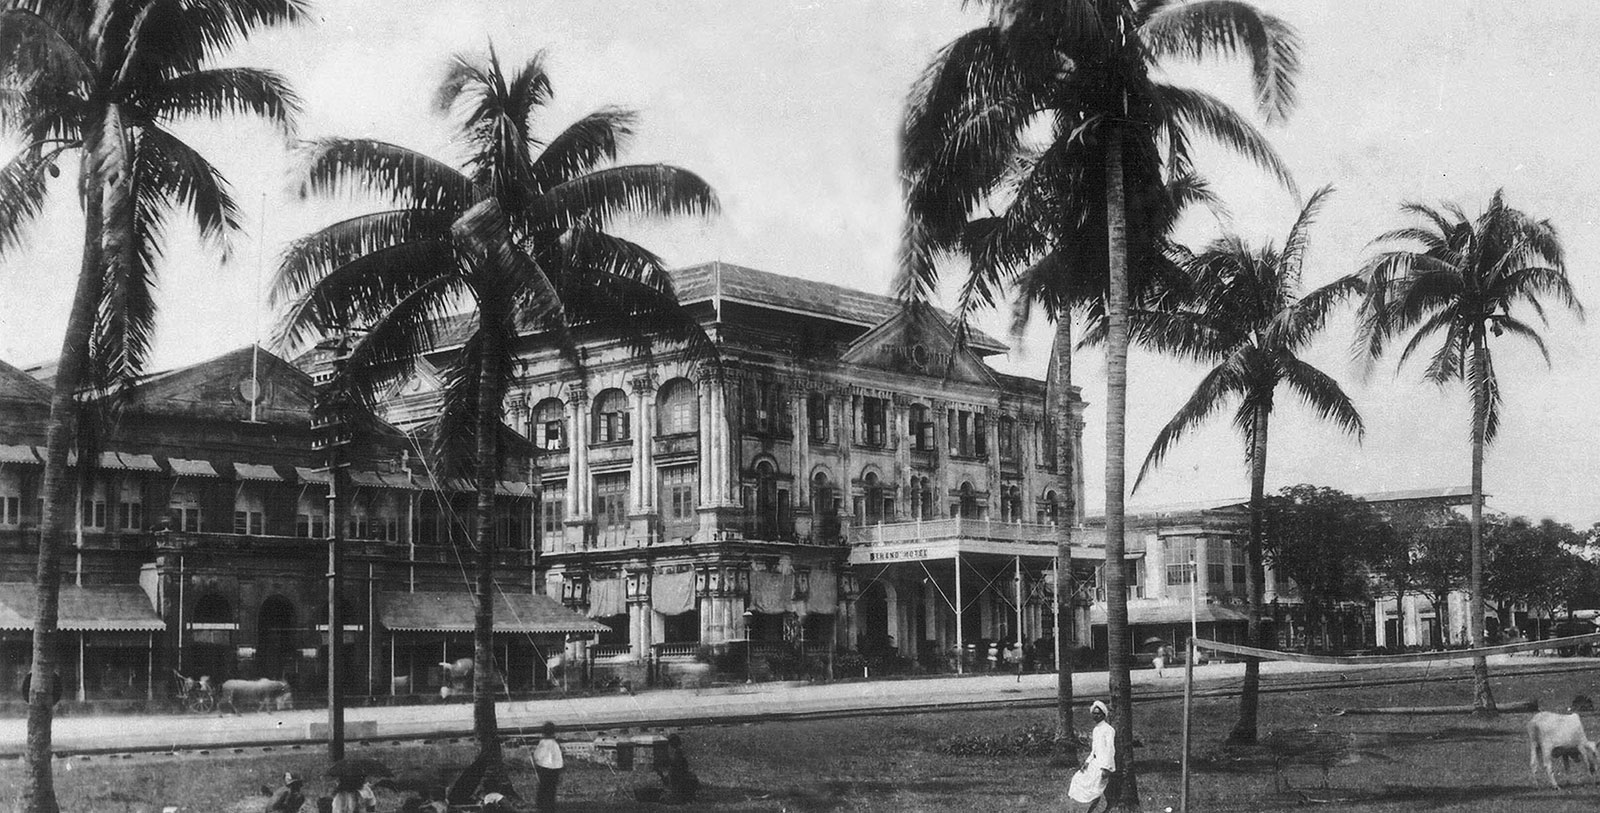 Historic Exterior of the Strand Hotel in Yangon, Myanmar